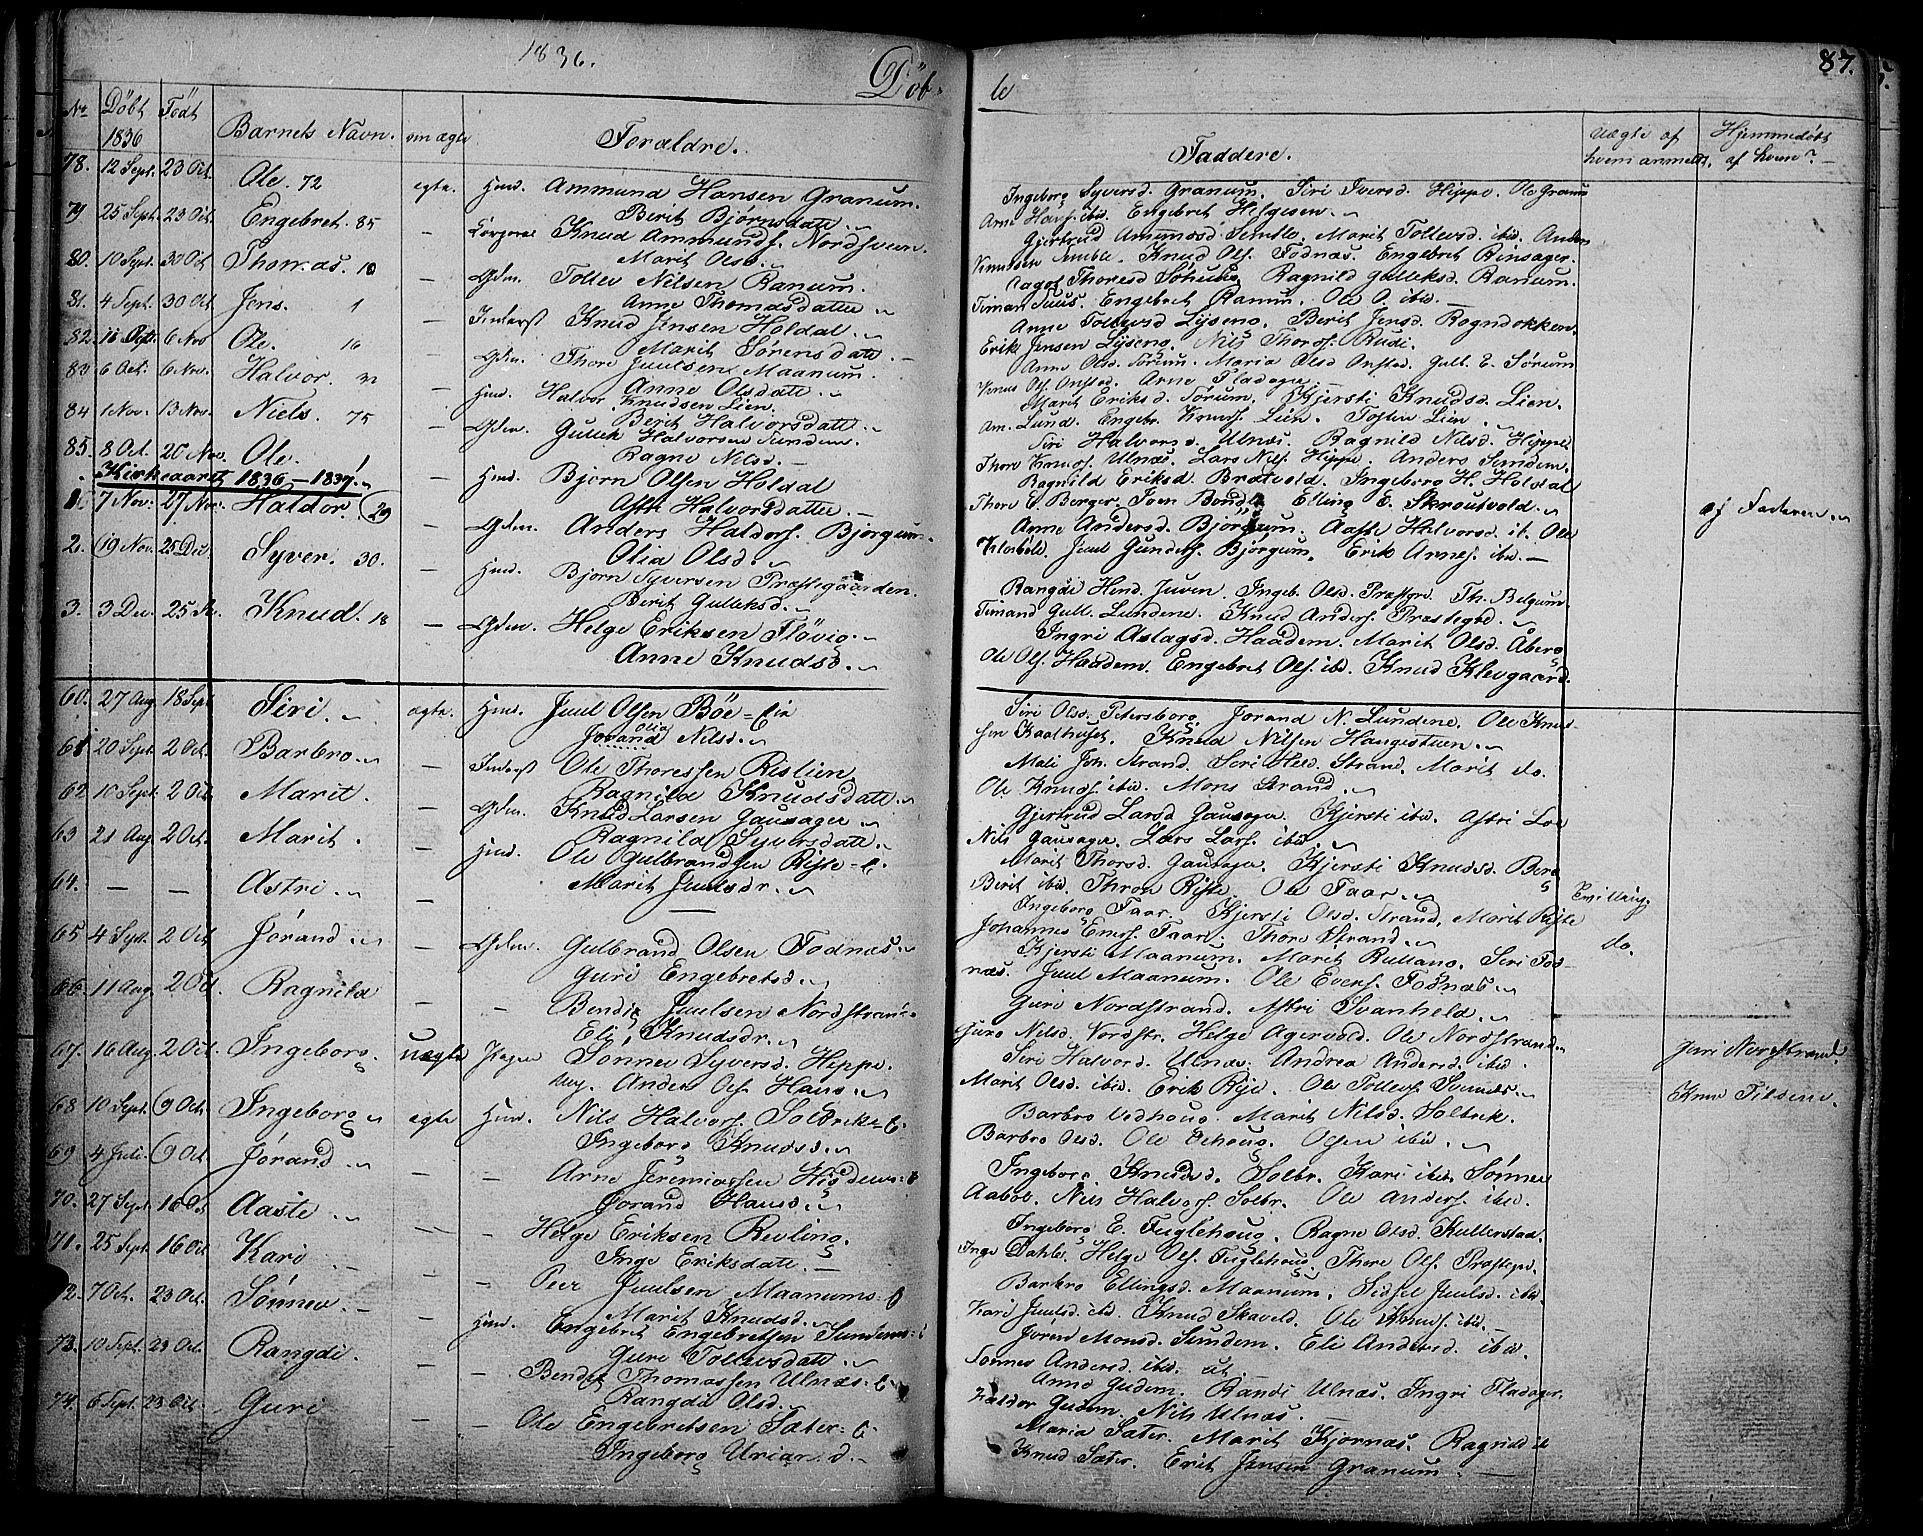 SAH, Nord-Aurdal prestekontor, Ministerialbok nr. 3, 1828-1841, s. 87